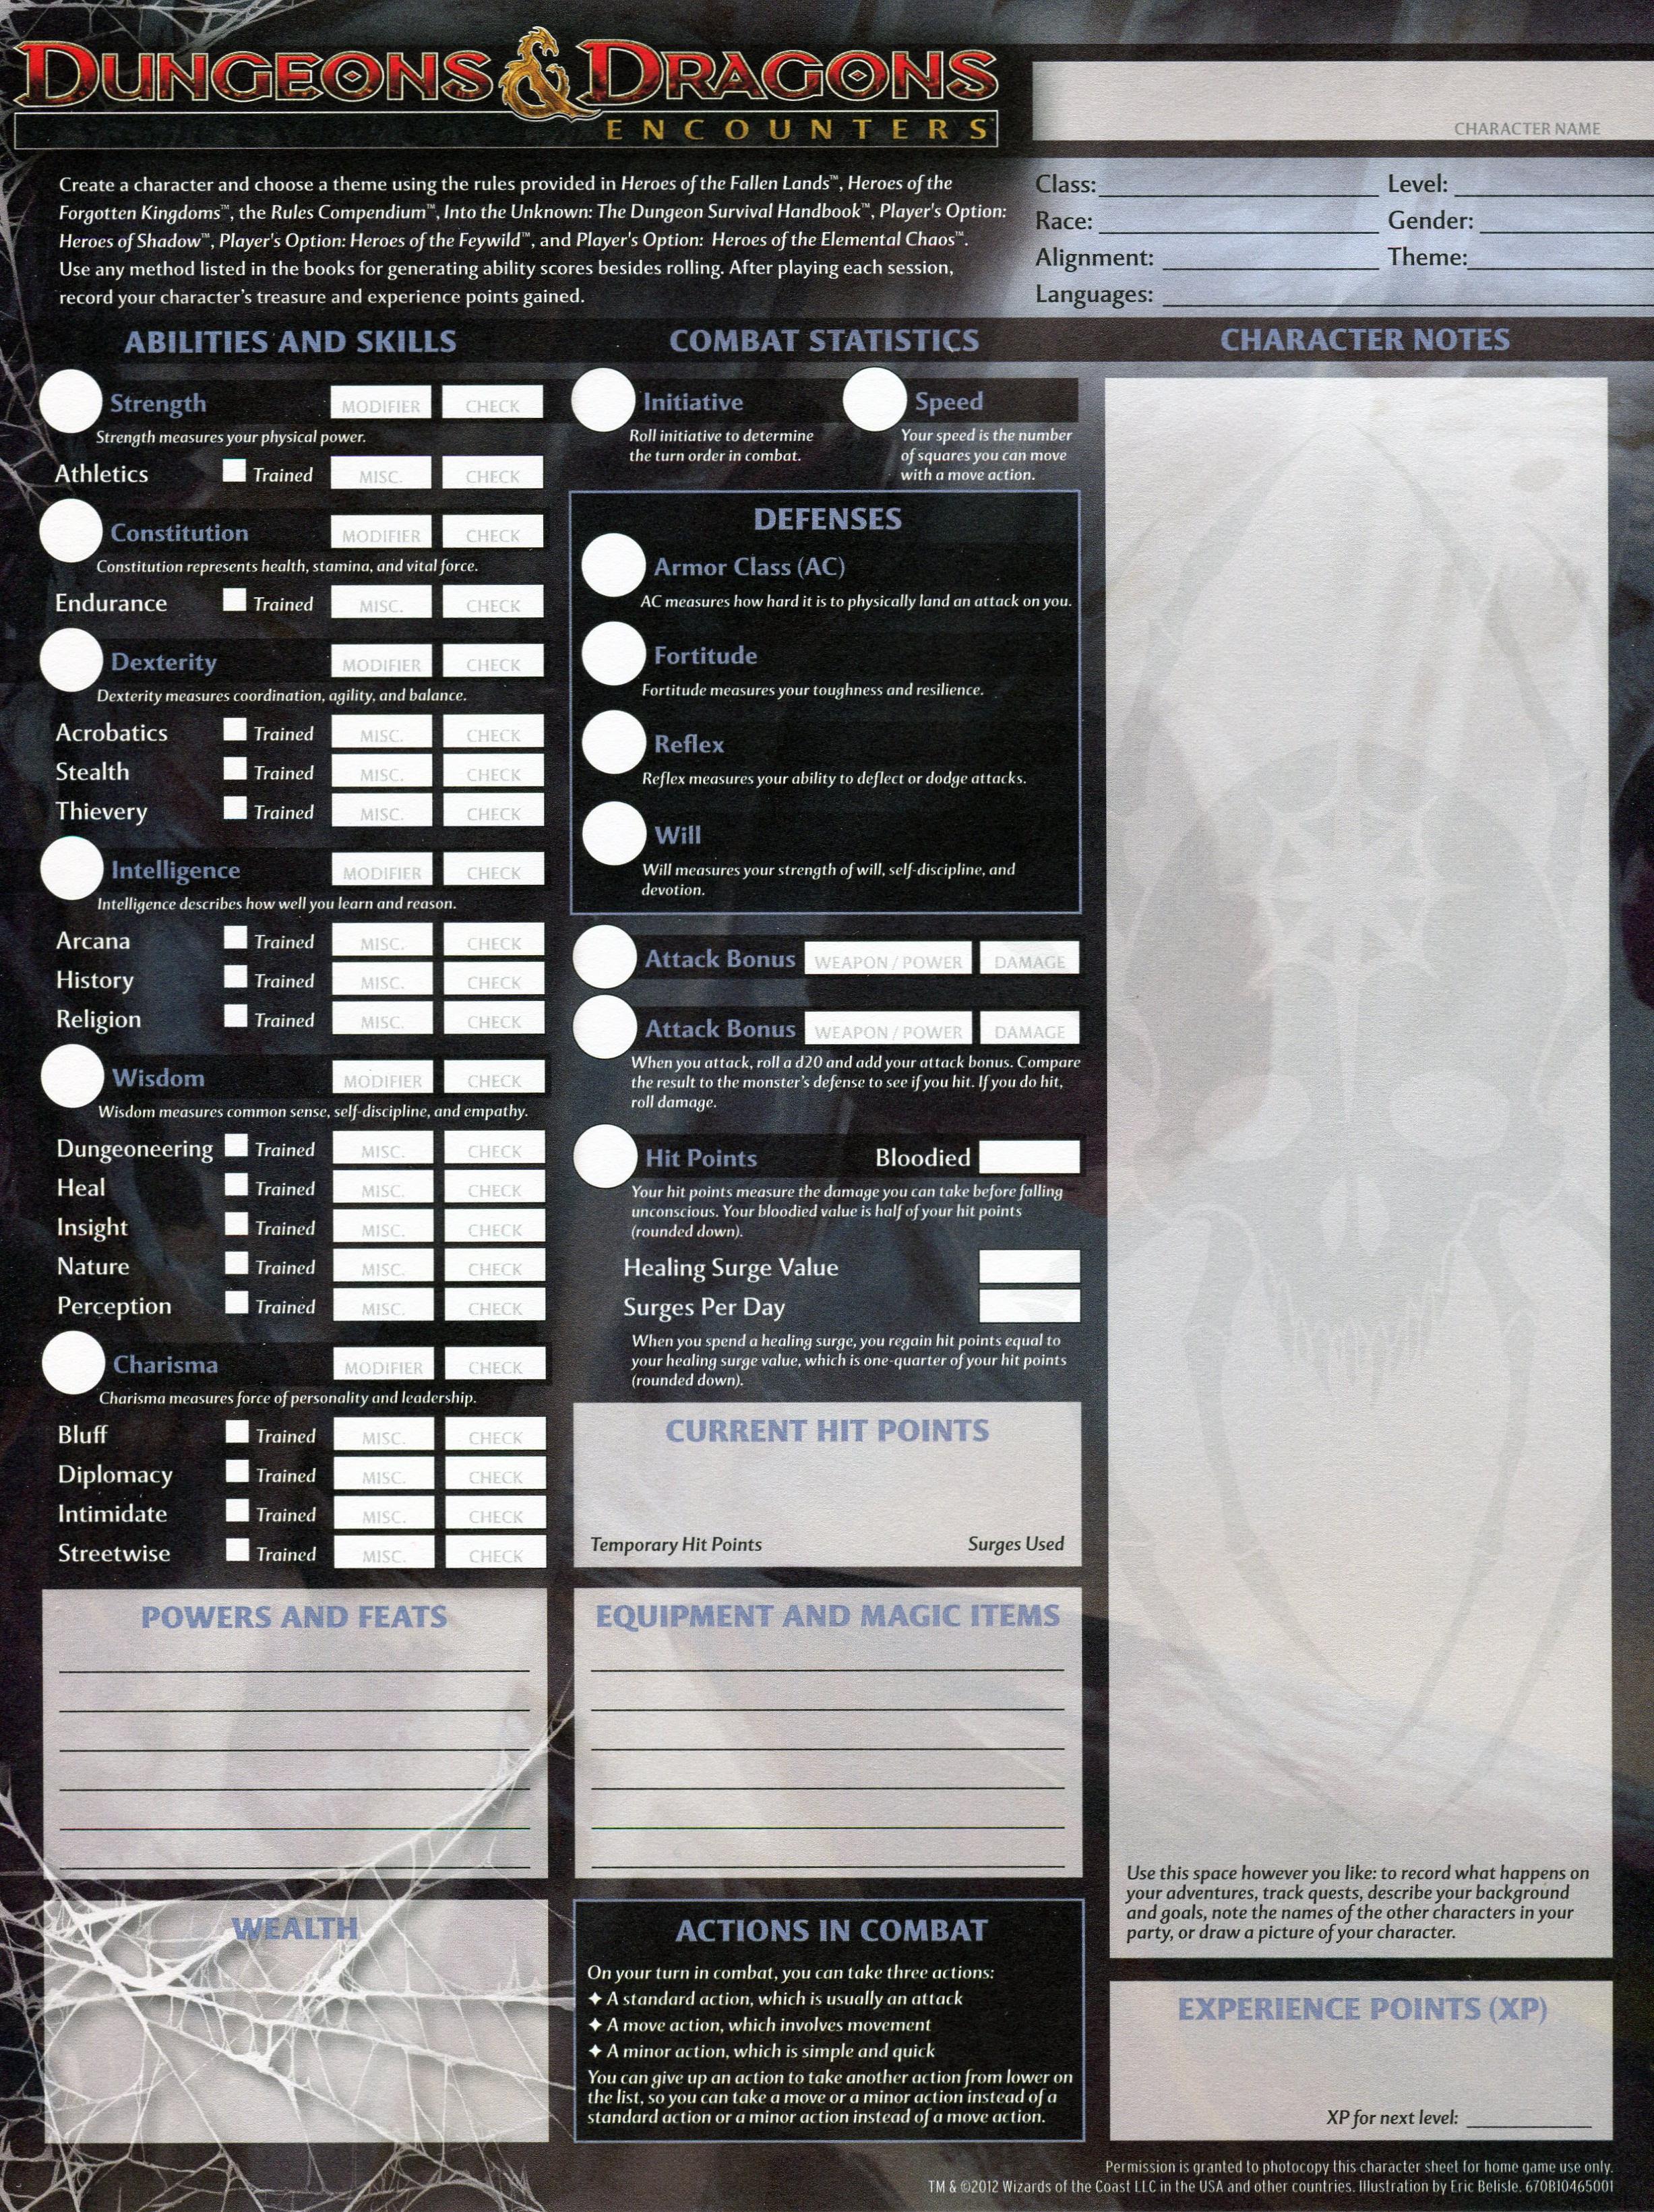 war-of-everlasting-darkness-character-sheet | Dungeon's Master